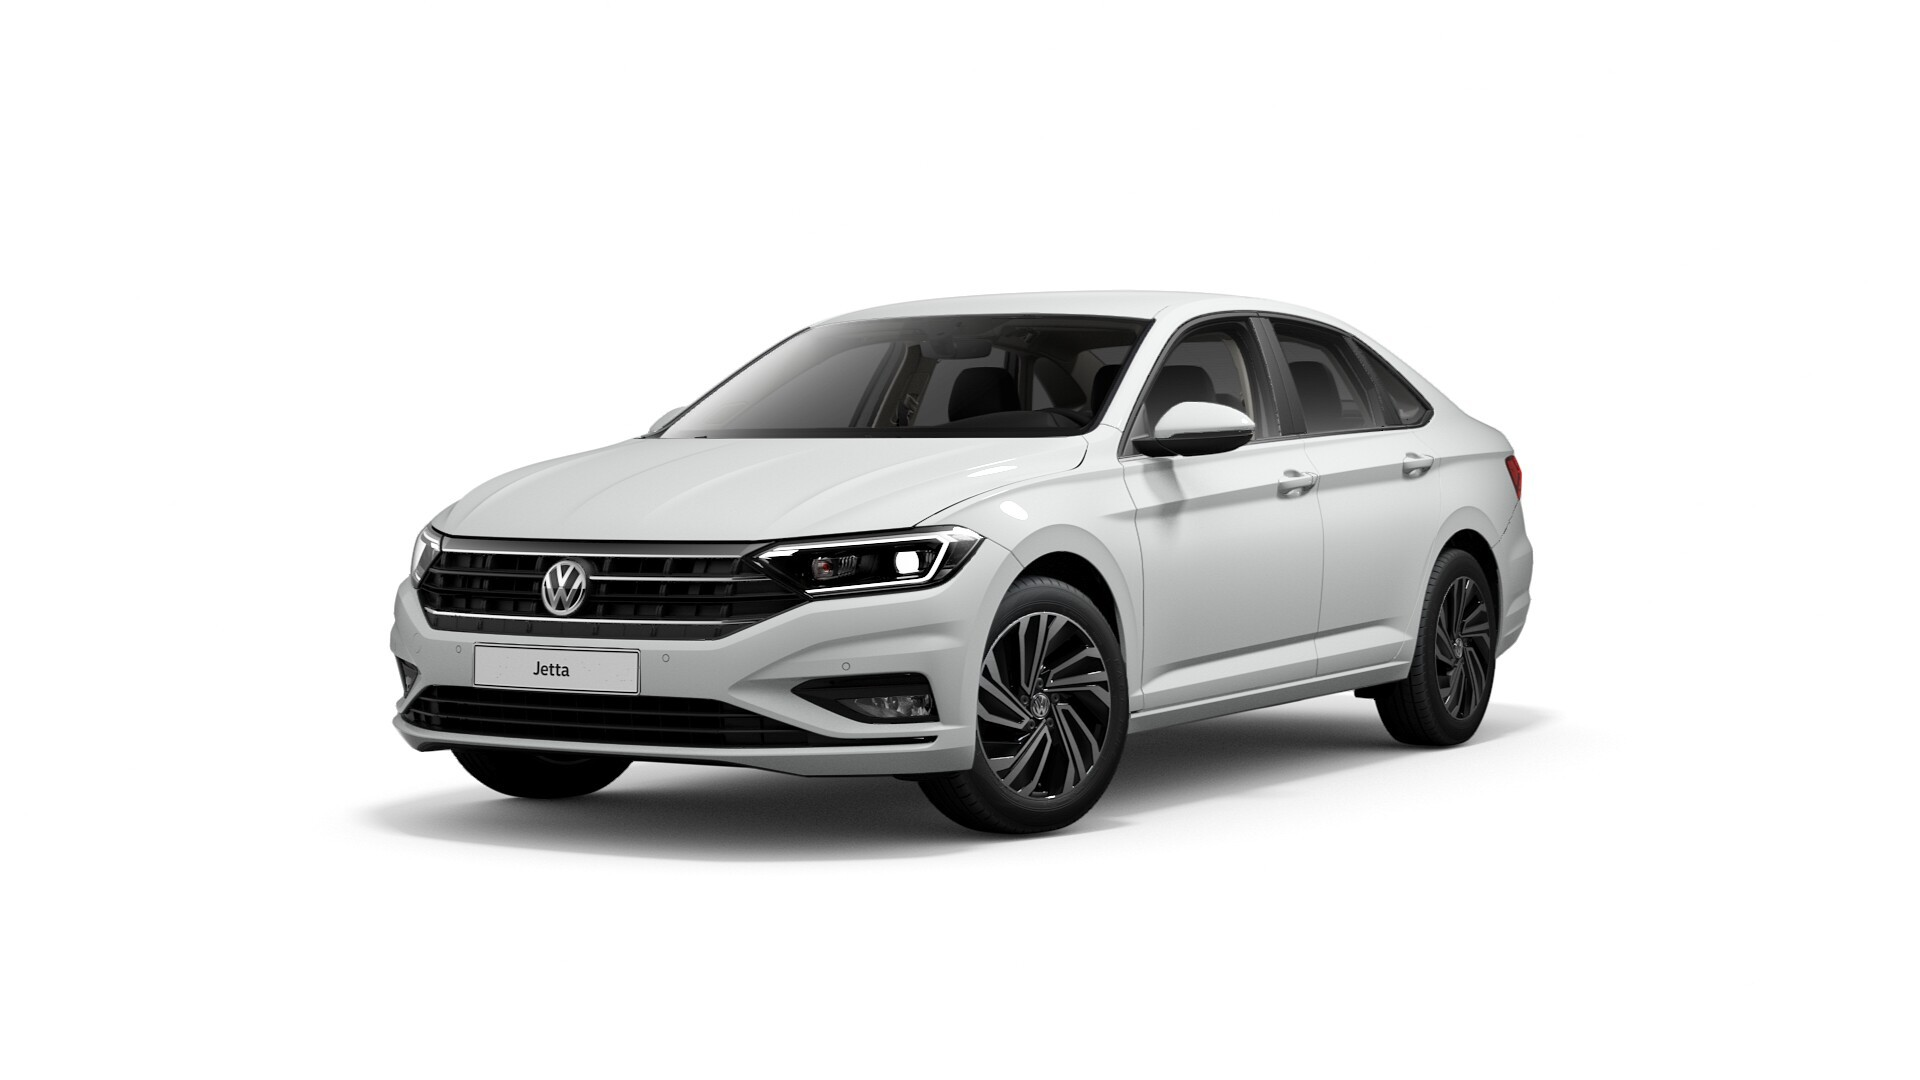 Volkswagen Jetta new Седан (Status)